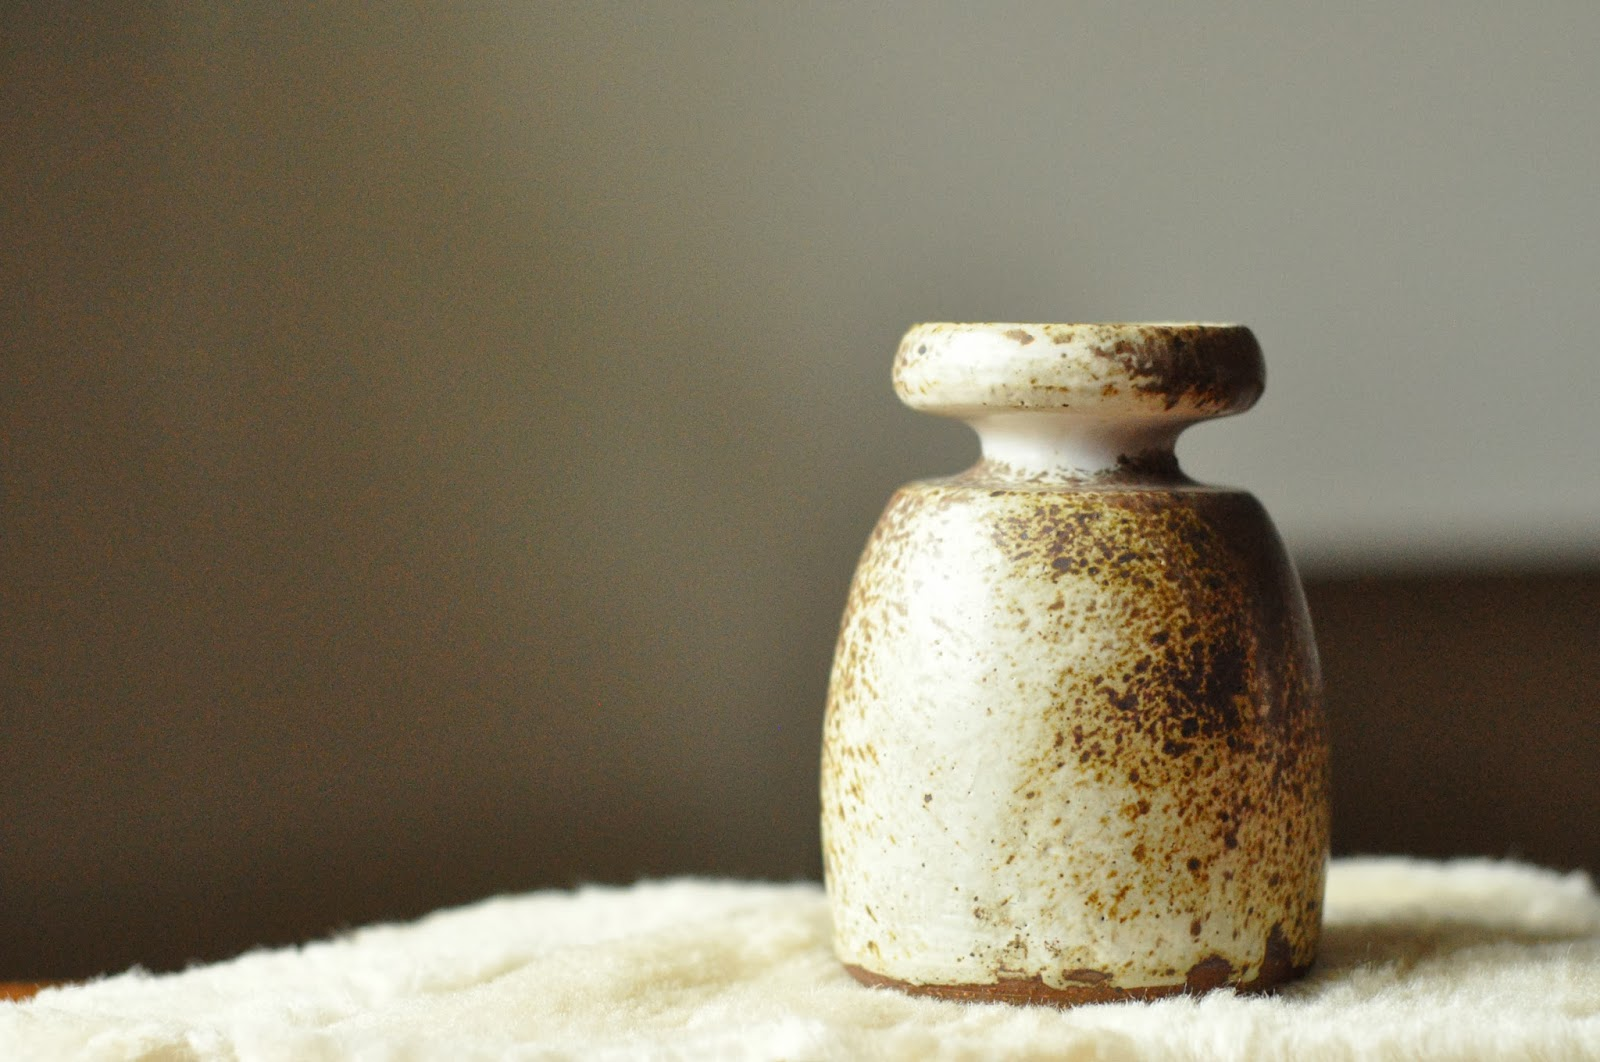 aage wurtz, ceramic vase, ceramic candle holder, ceramic candlestick,  aage wurtz keramik, danish pottery, danish studio pottery